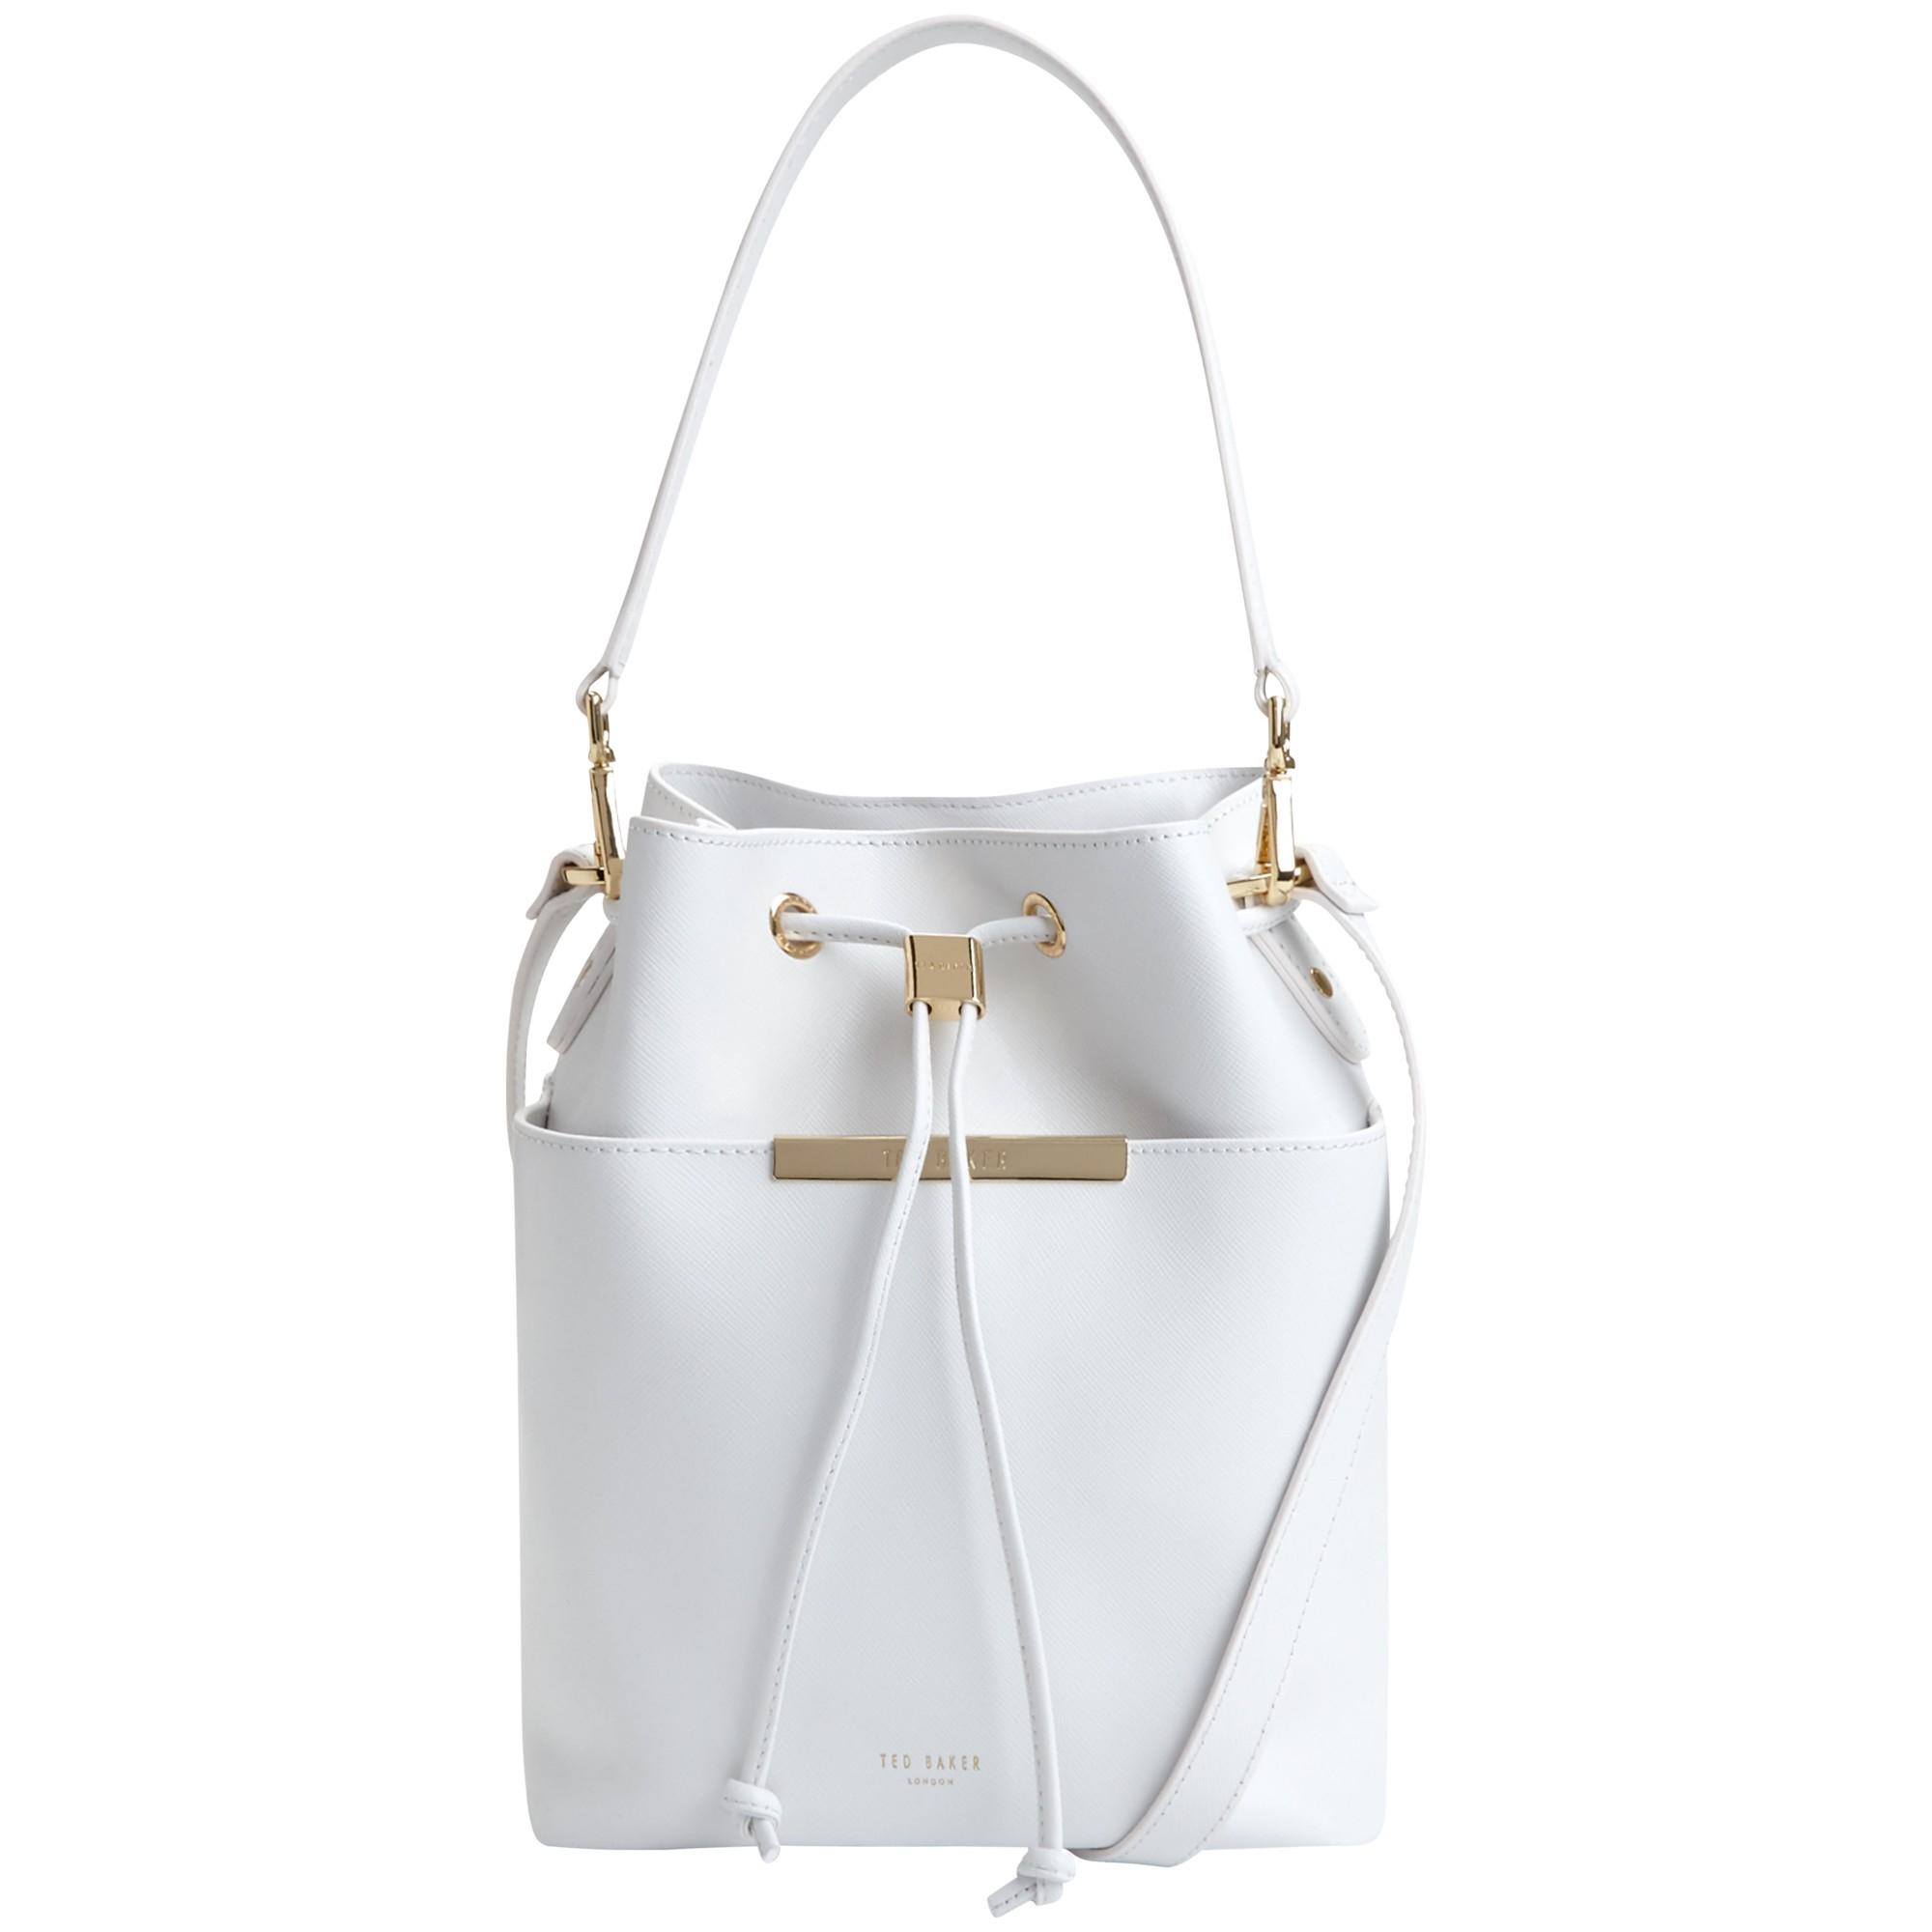 a6dee839d87b8 Ted Baker Adrene Mini Bucket Leather Across Body Bag in White - Lyst